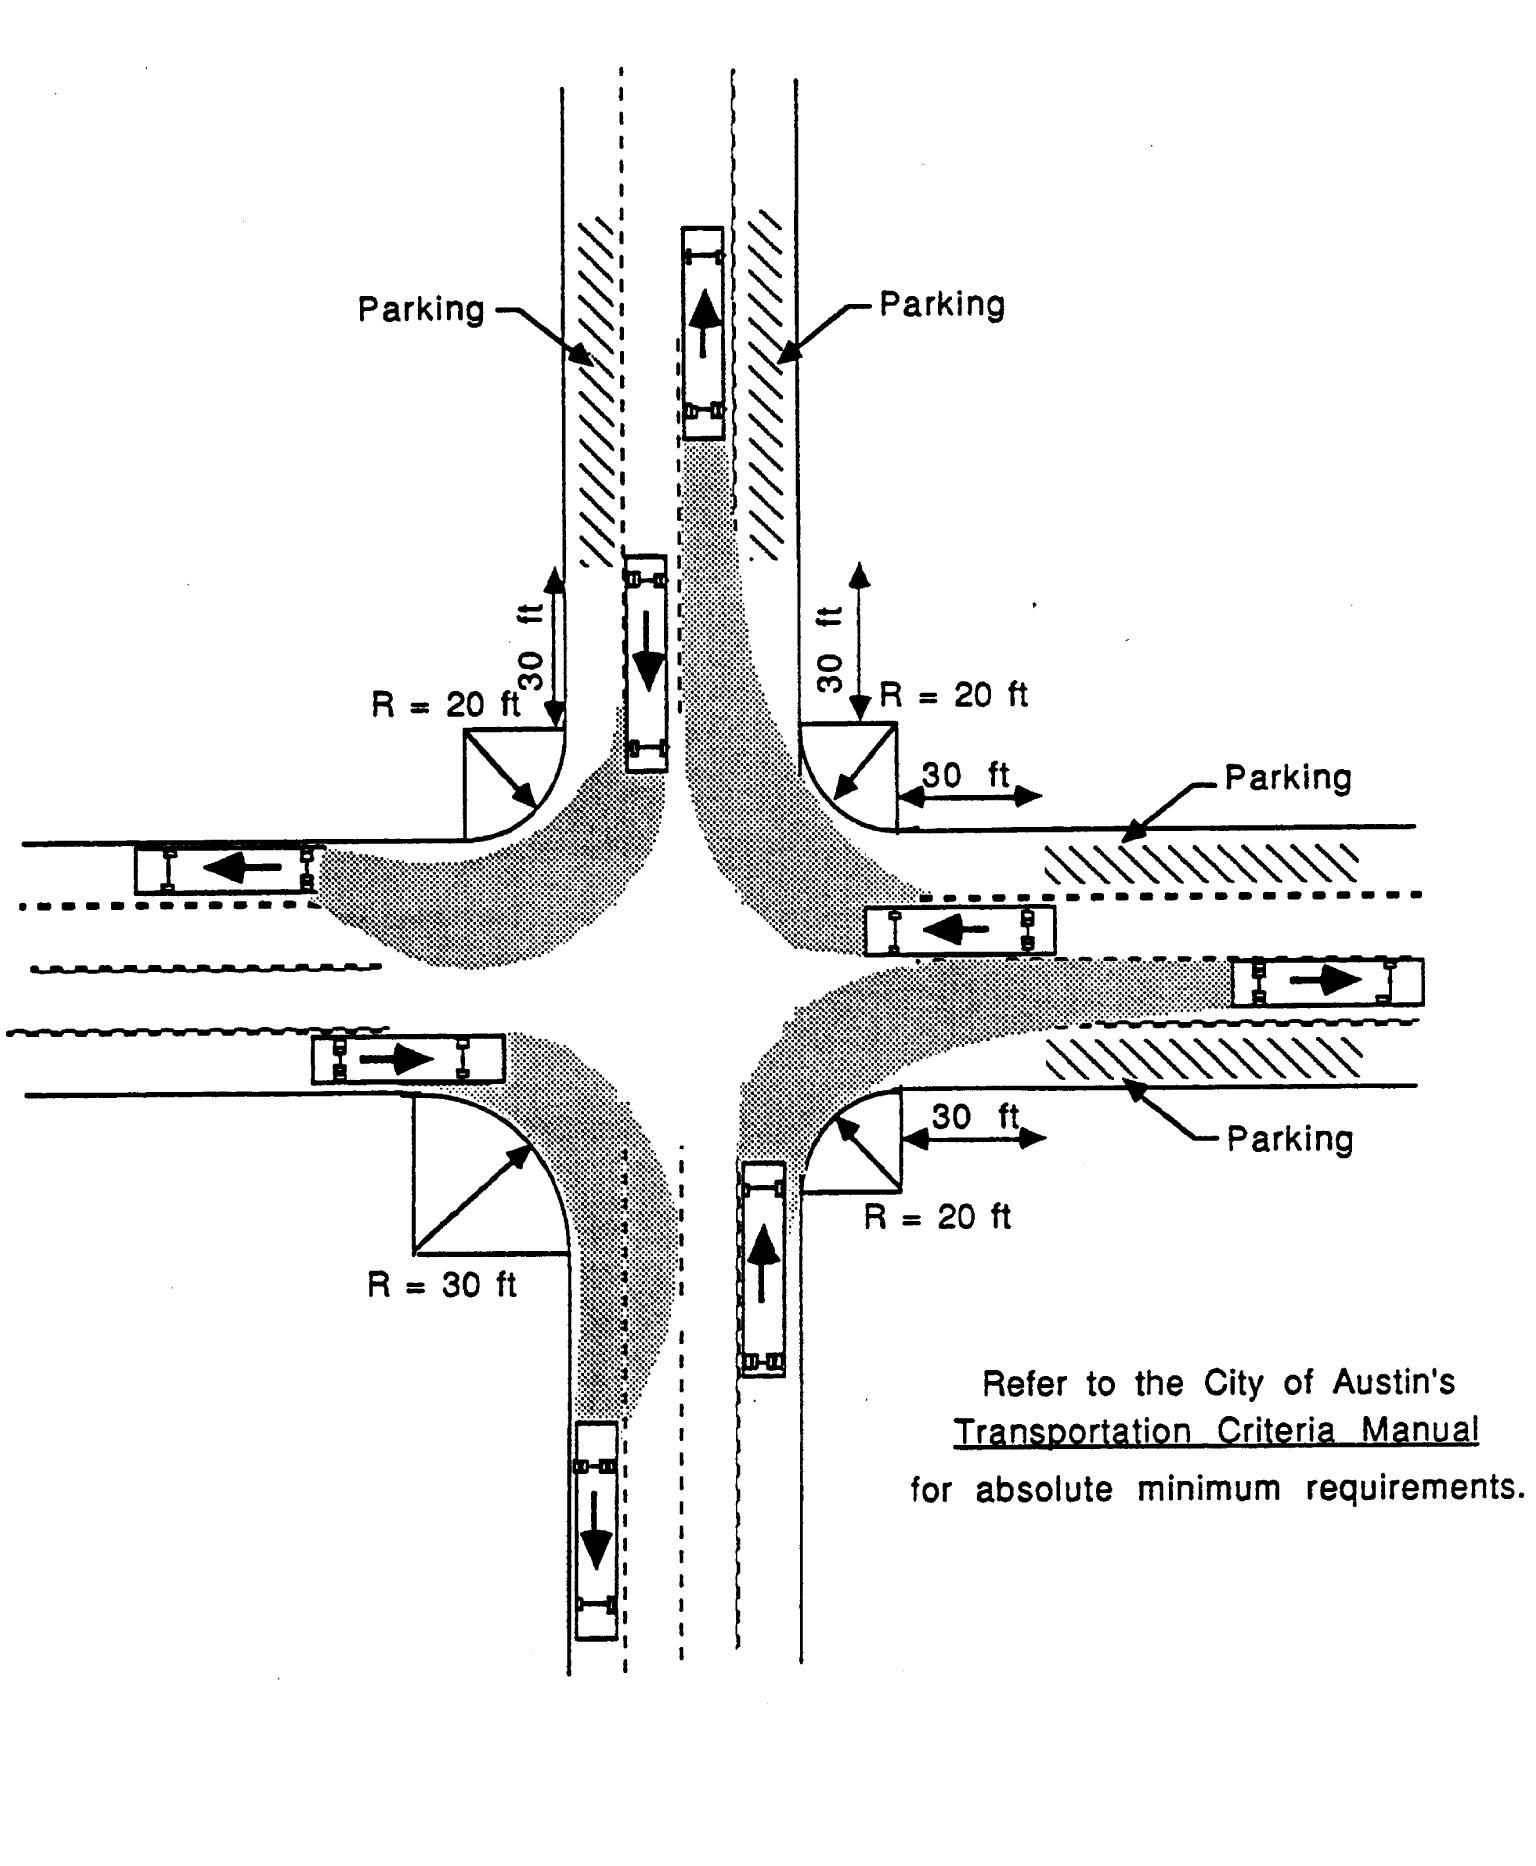 Car Turning Radius Diagram Wonderful Turning Radius Templates Ideas Examples Professional Of Car Turning Radius Diagram